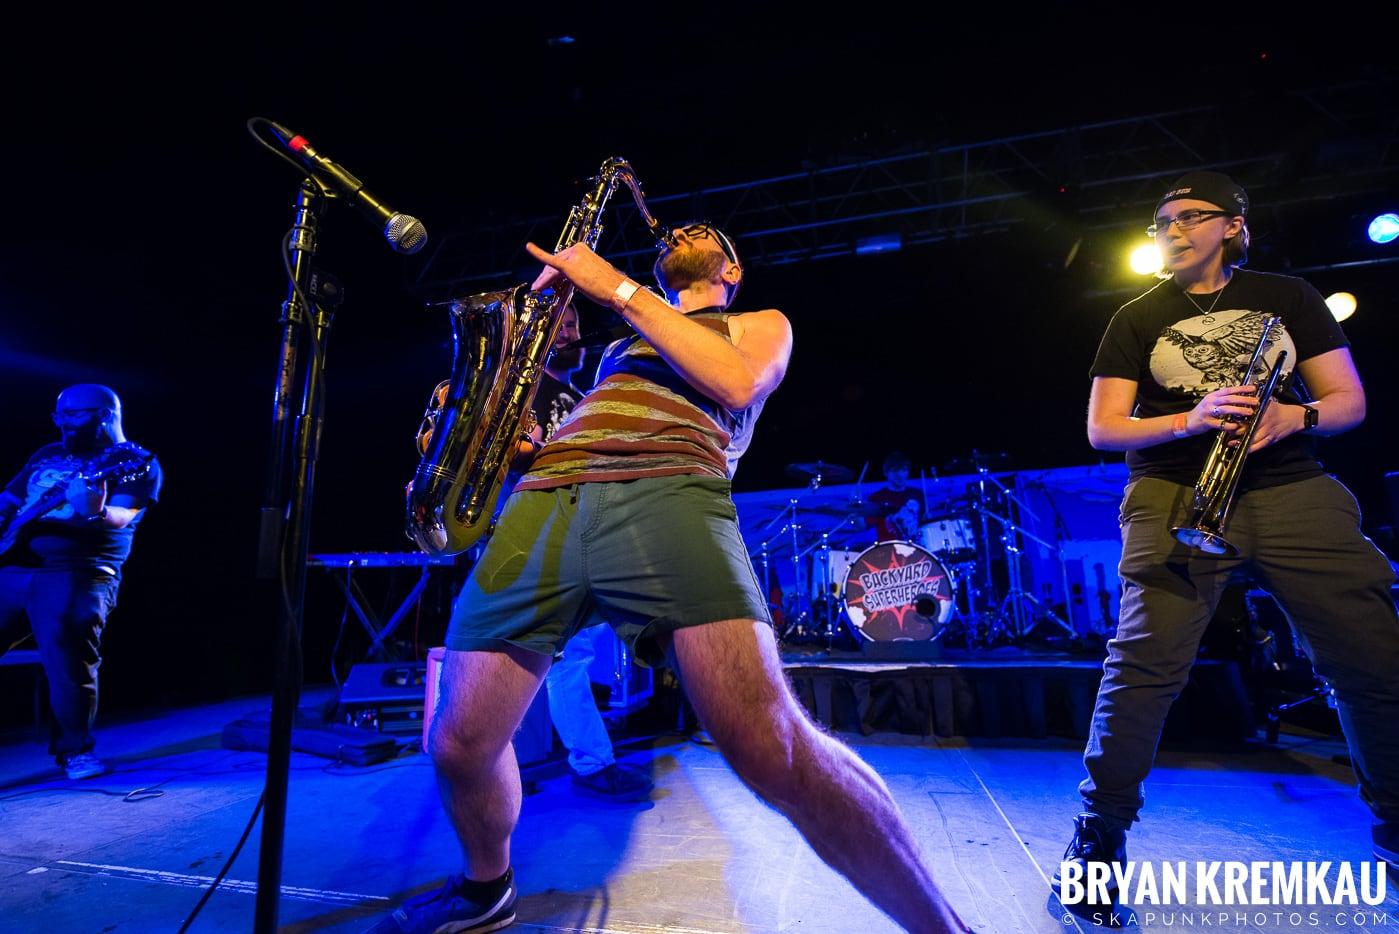 Backyard Superheroes @ Starland Ballroom, Sayreville, NJ - 11.23.18 (1)